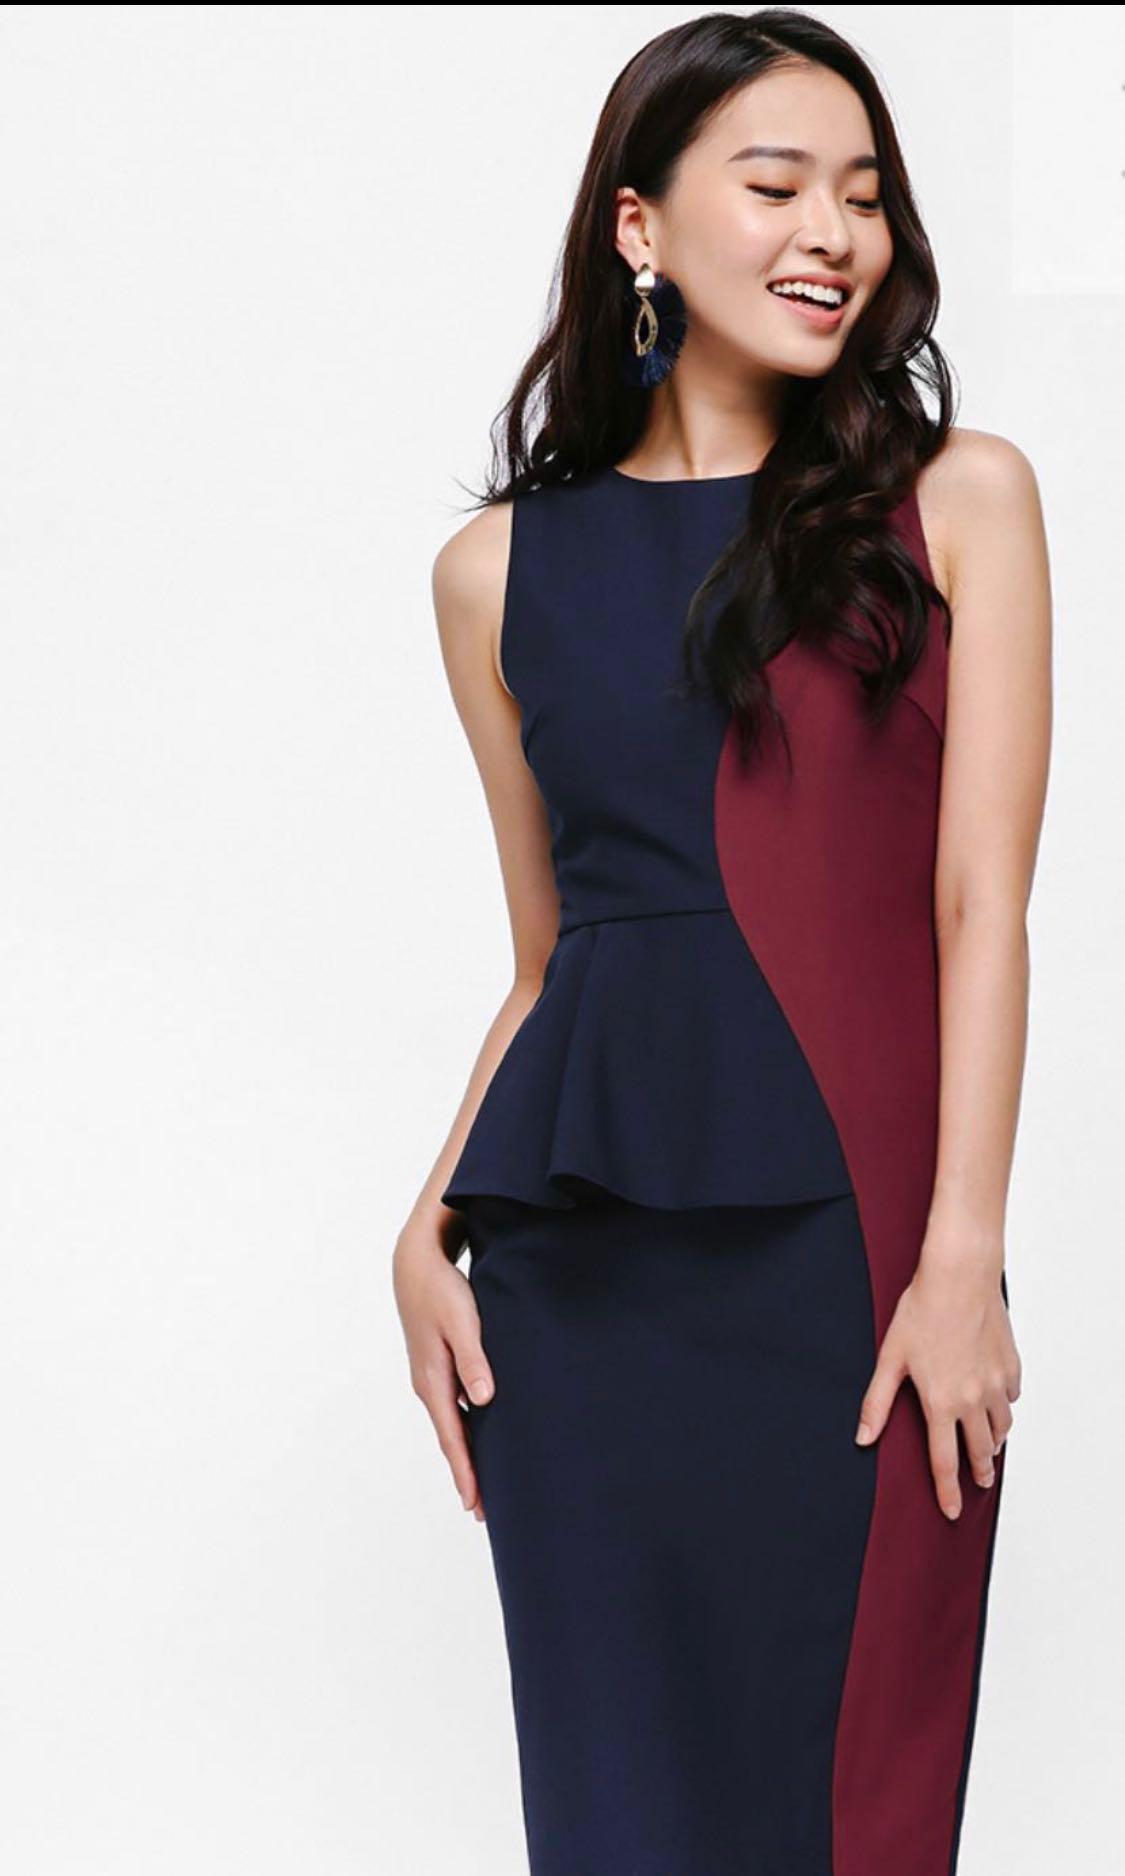 e26565871a LoveBonito LB Sinead Contrast Peplum Dress Navy Blue